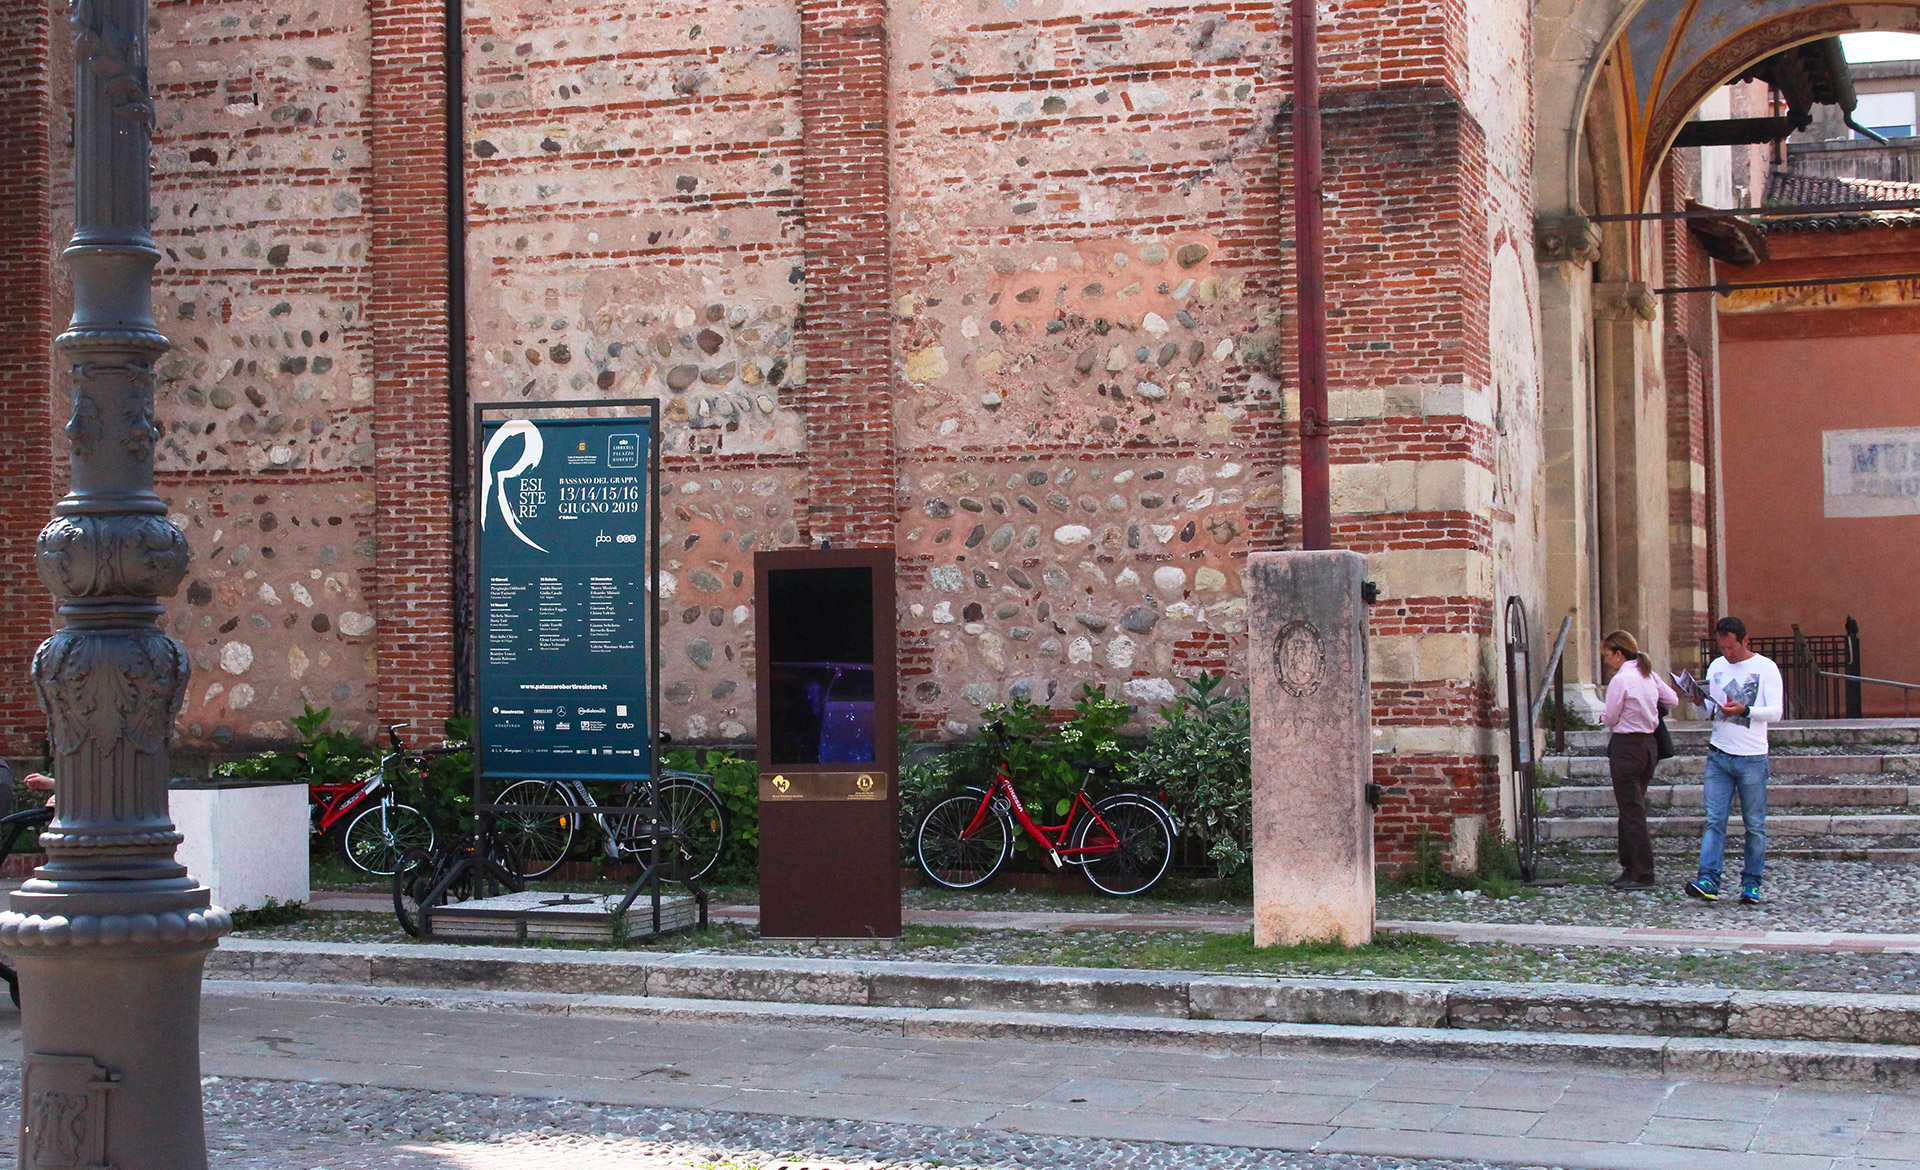 Resistere-Palazzo-Roberti-Blank-2019-3